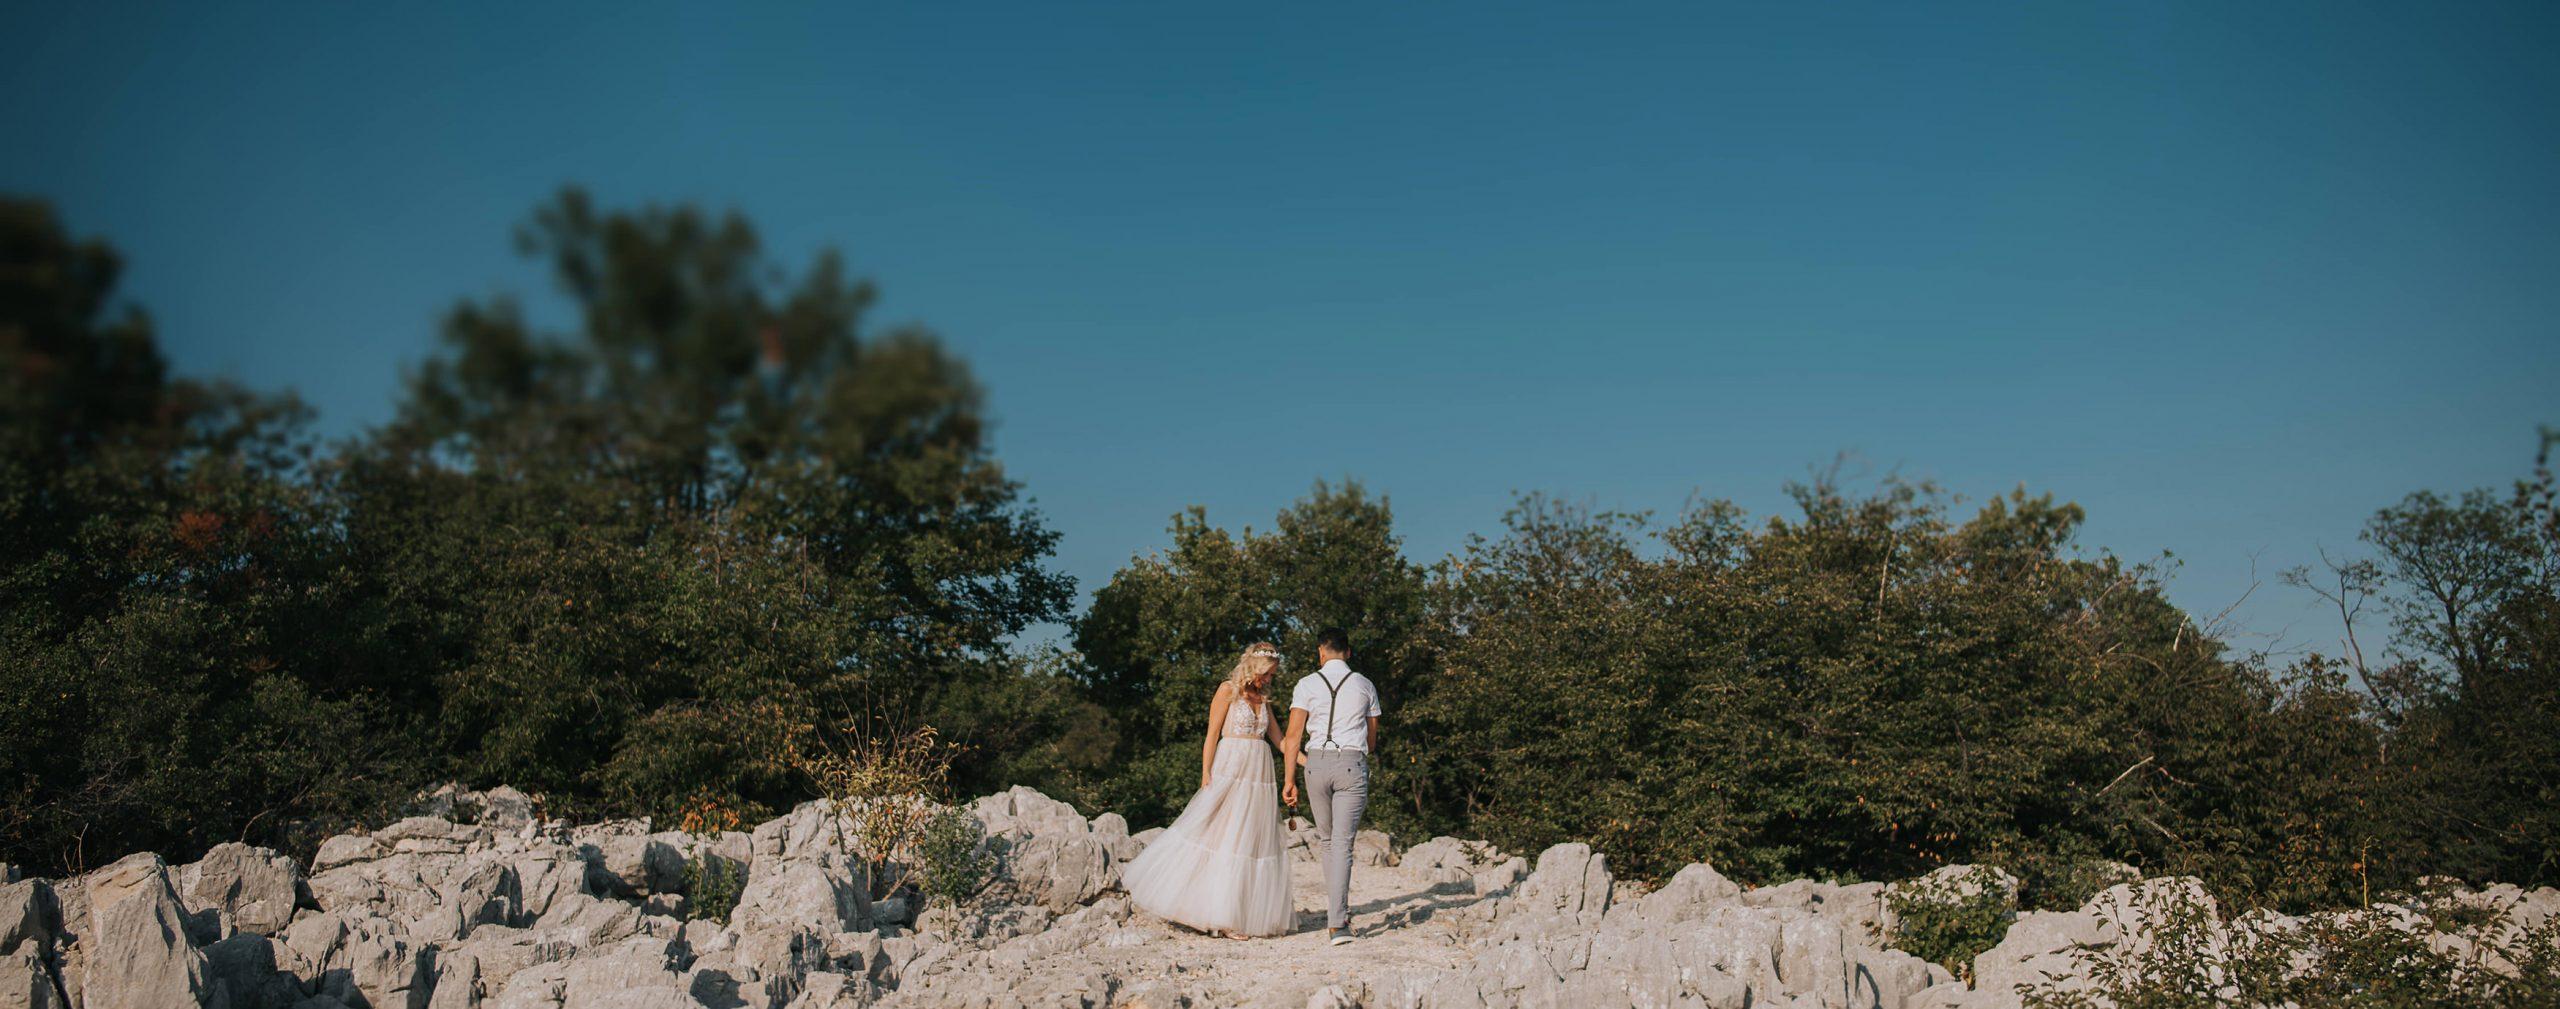 Croatia destination wedding photographer